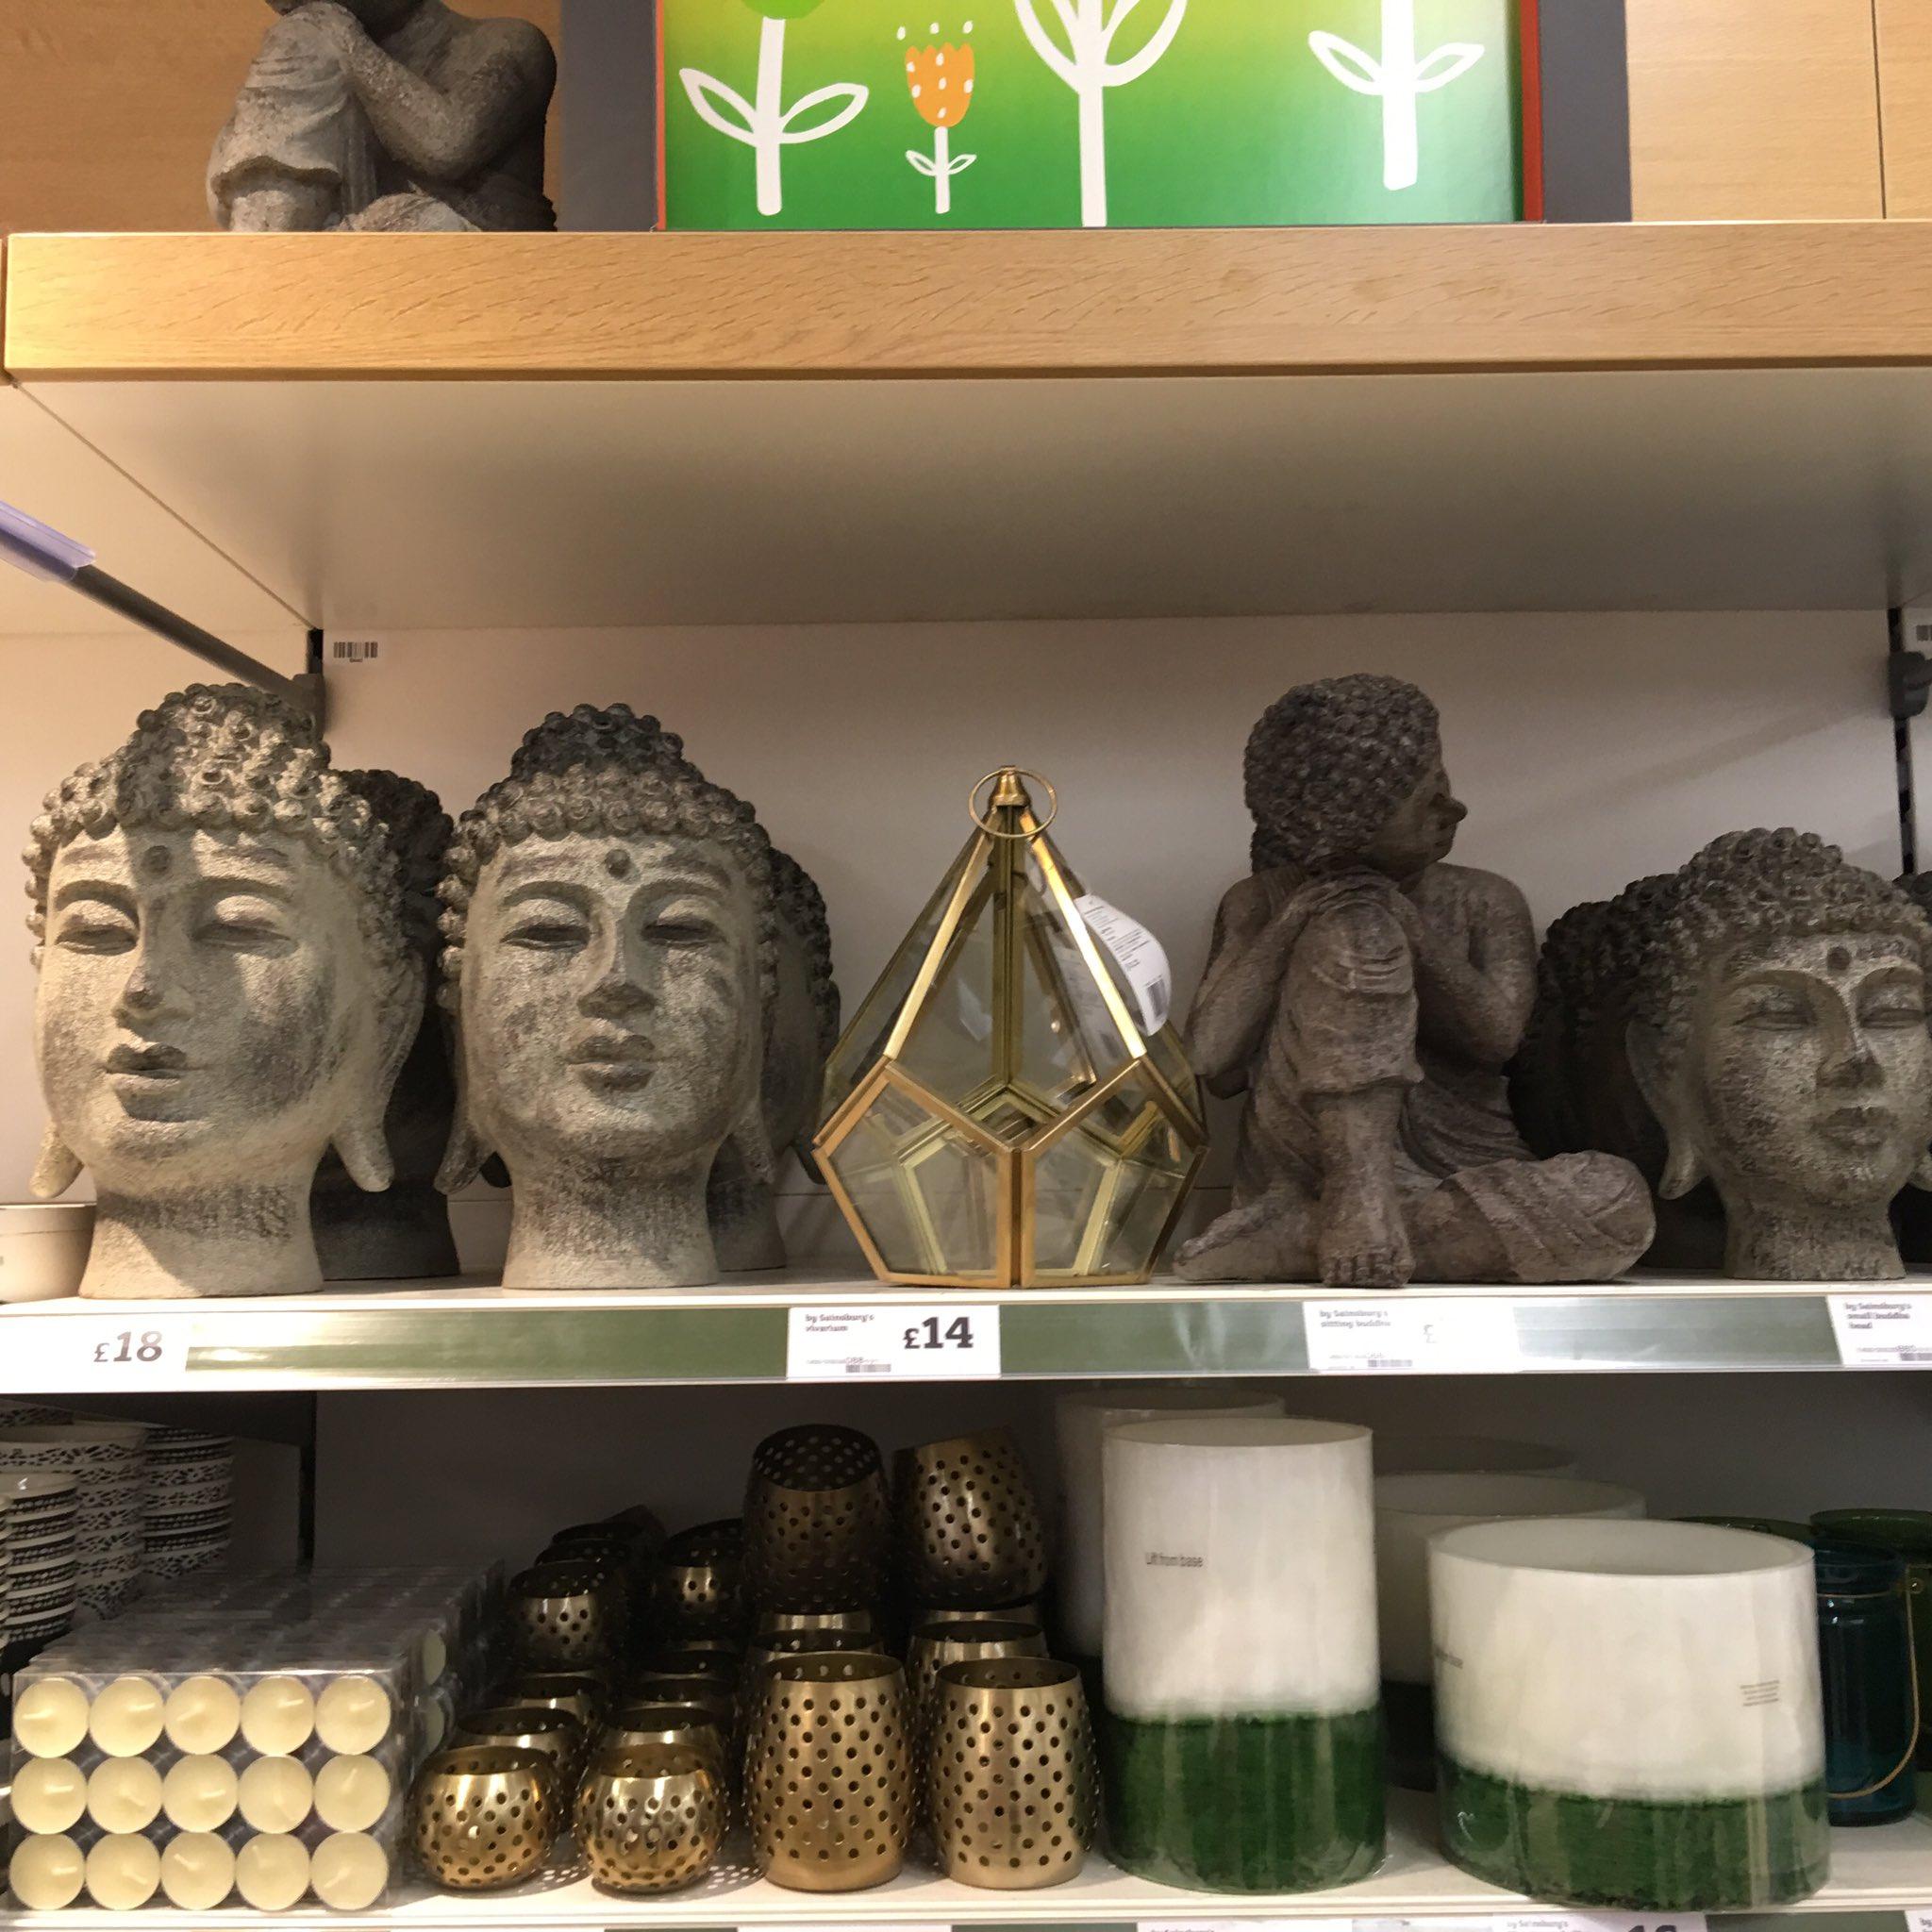 Buddha, standard! https://t.co/i2zqqoAifk